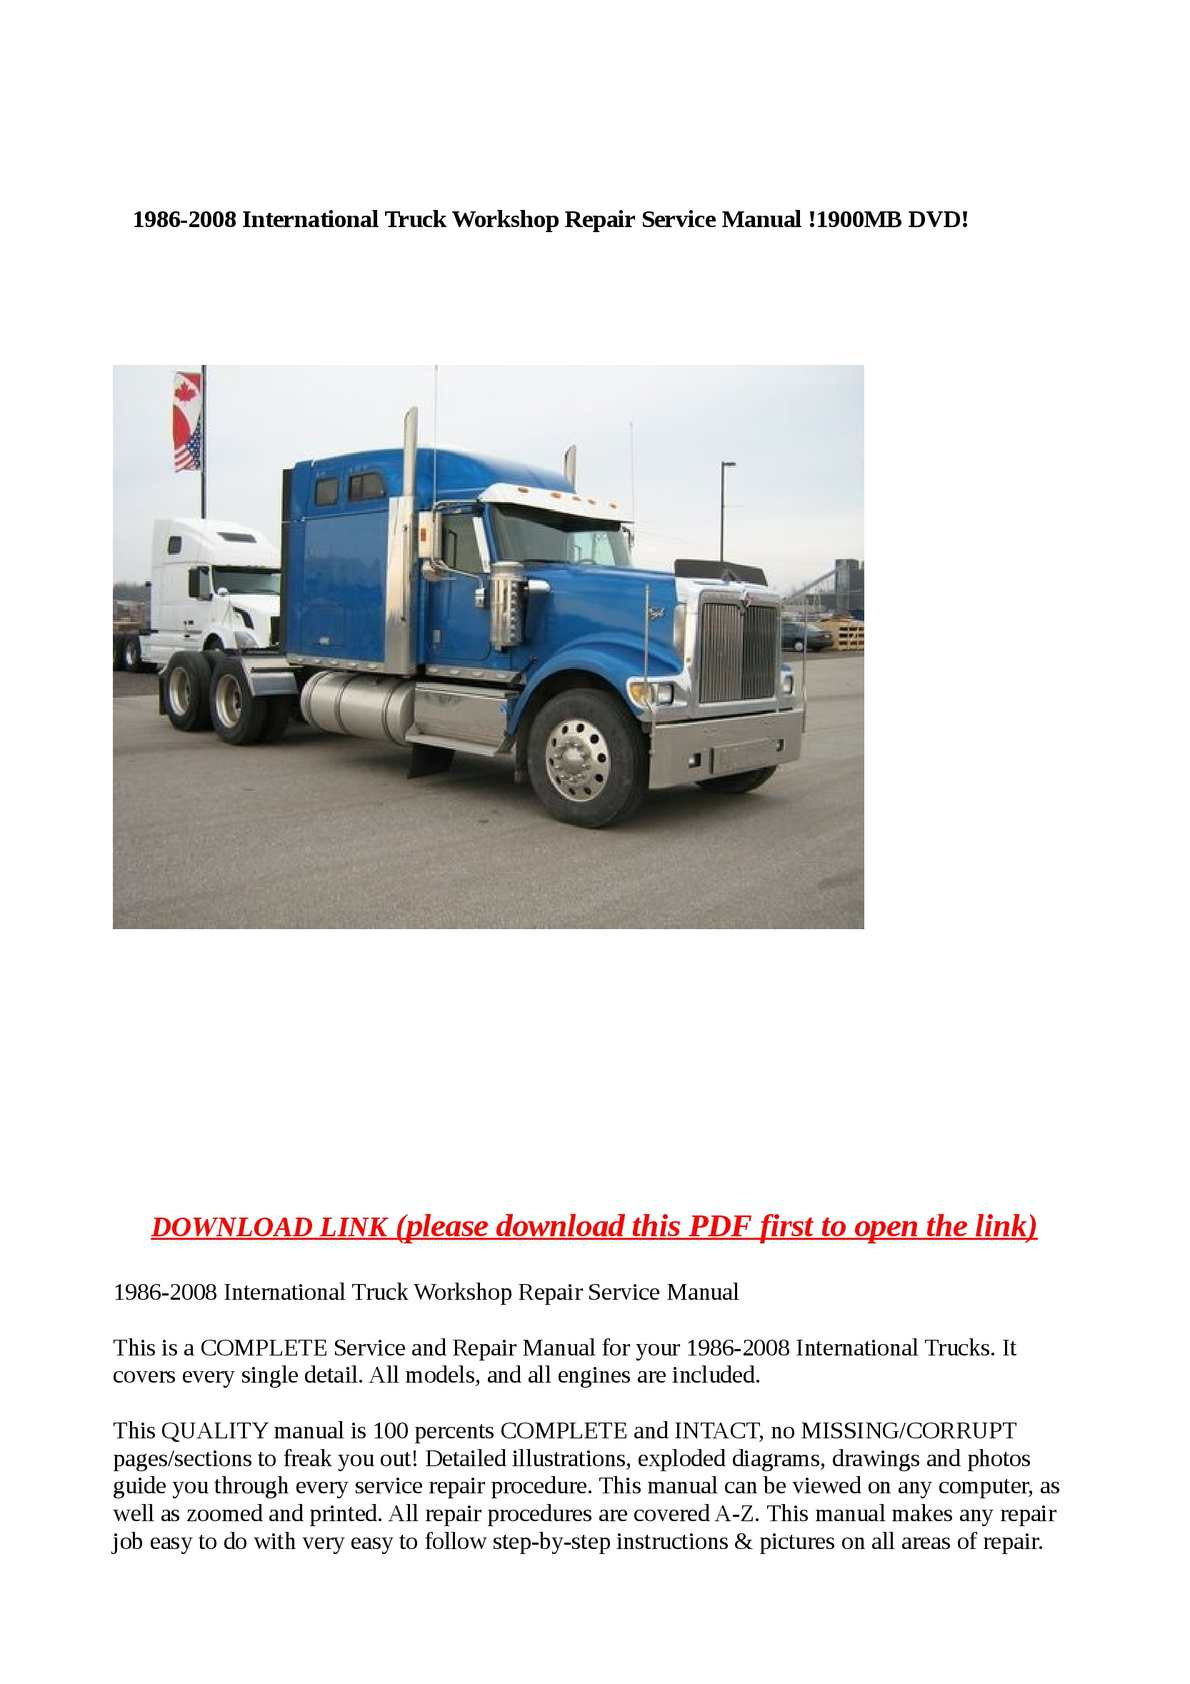 hight resolution of calam o 1986 2008 international truck workshop repair service manual 1900mb dvd